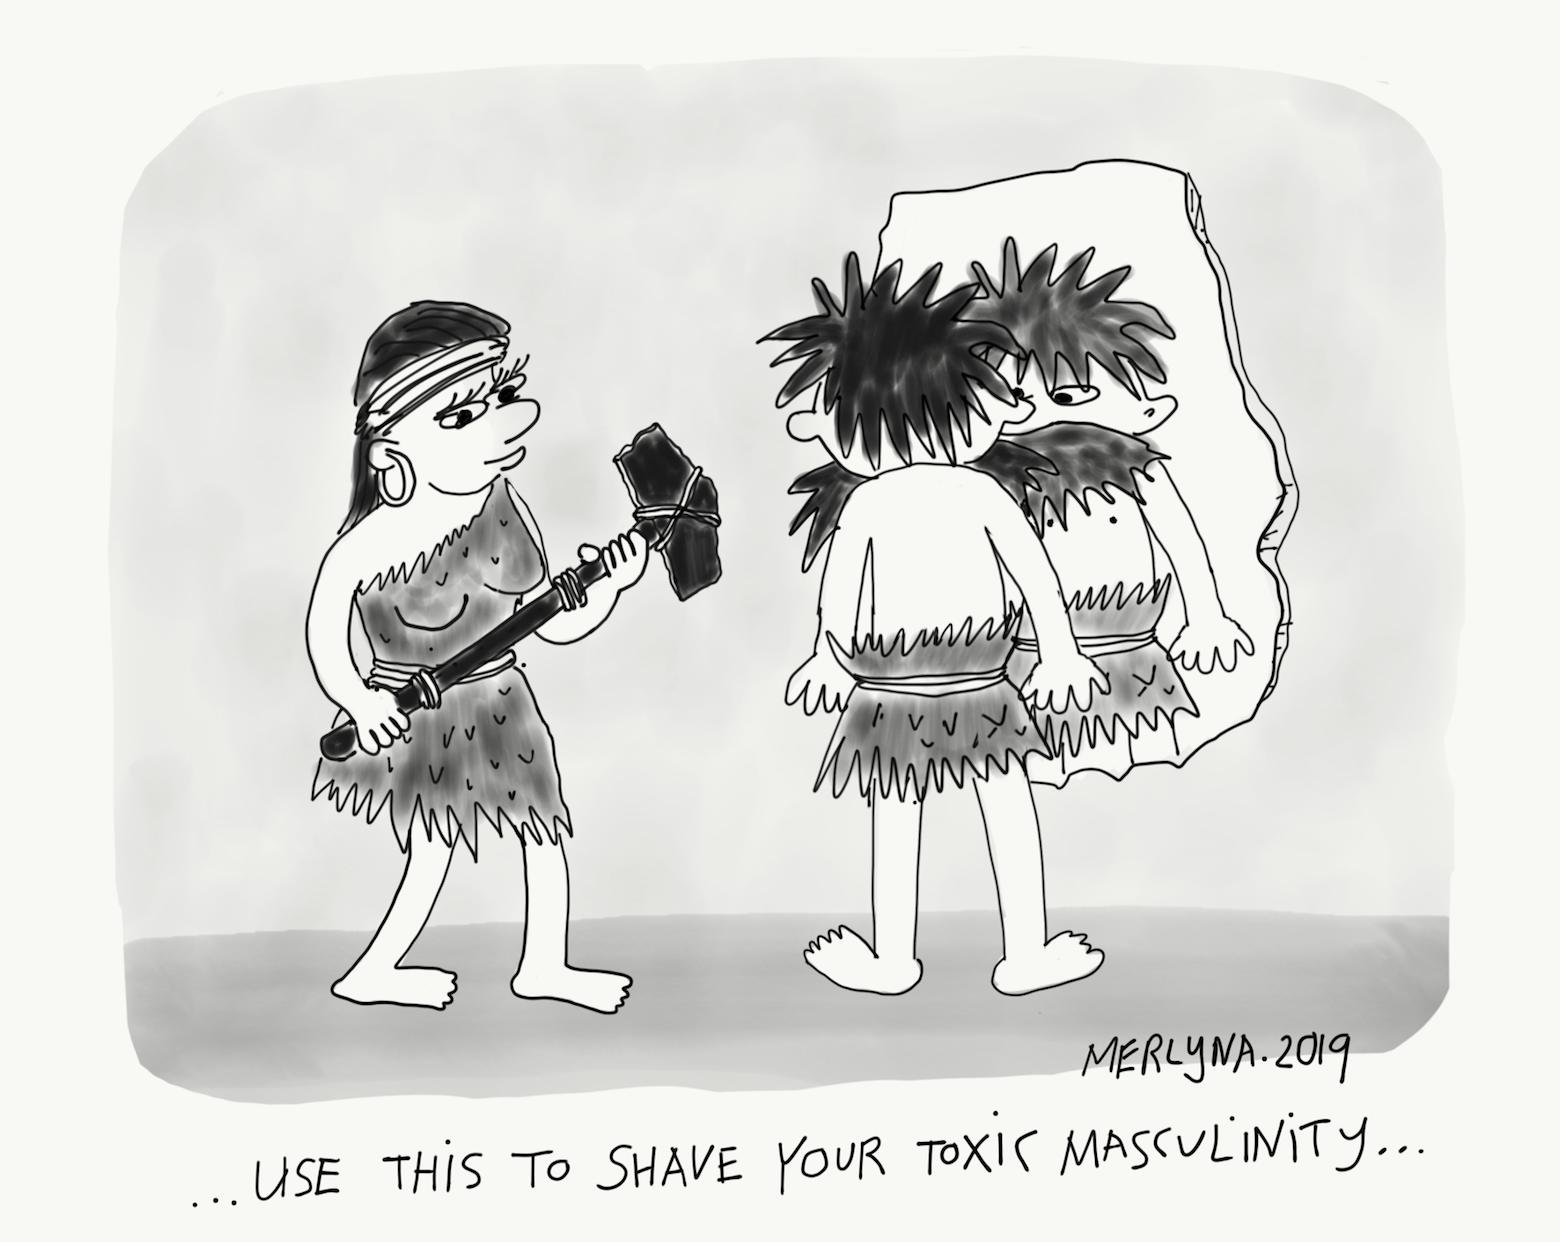 Cartoon] Toxic Masculinity - ALiGN: Alternative Global